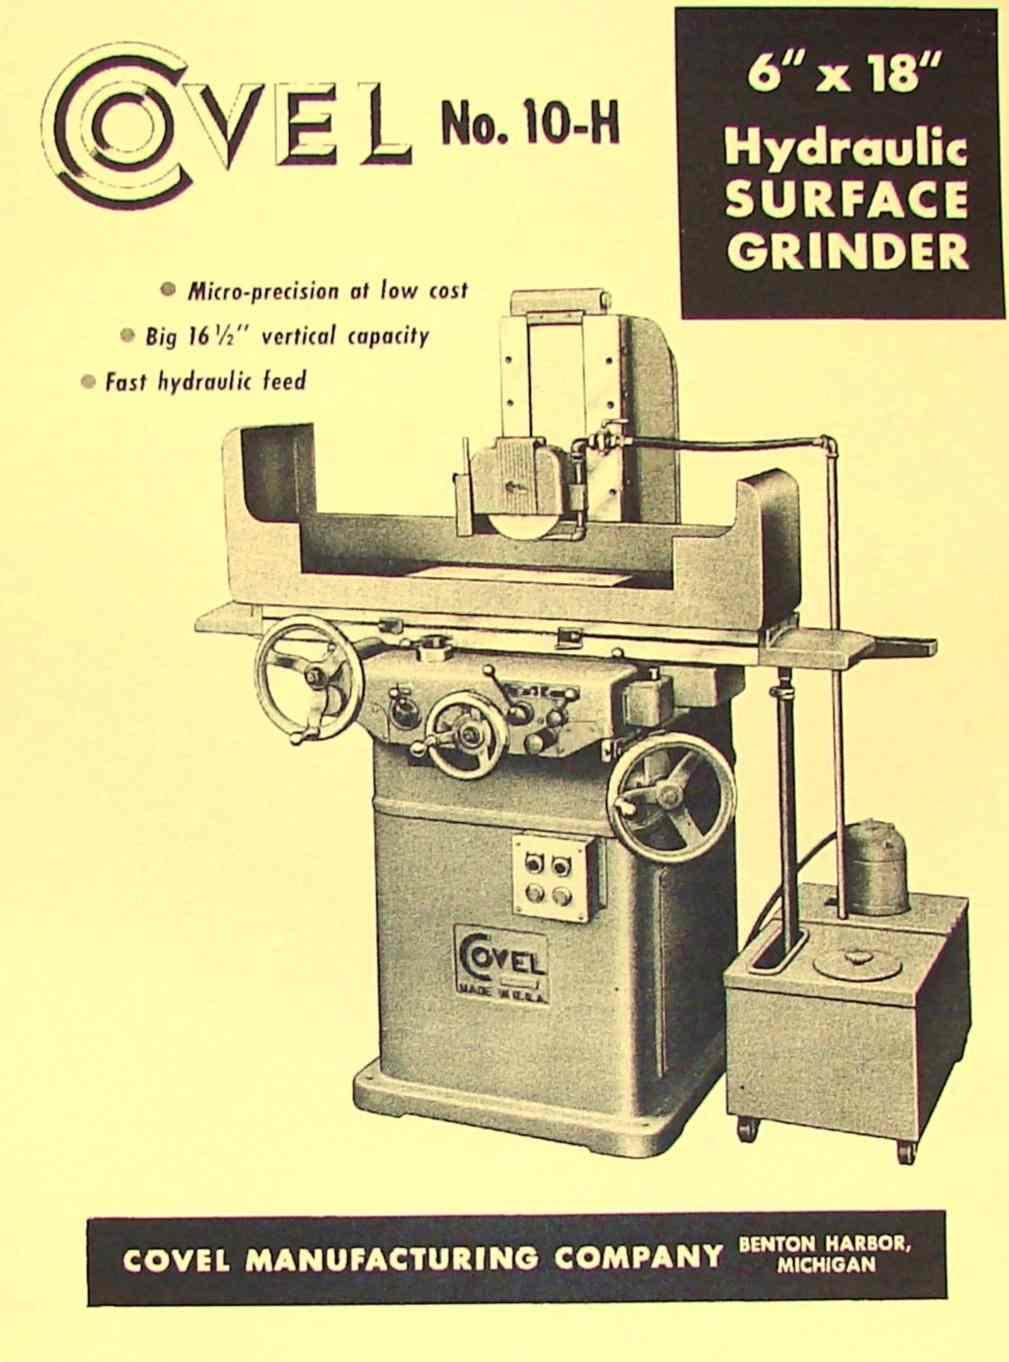 covel no 10h 618 surface grinder 6x18 operator parts manual rh ozarktoolmanuals com reid 618 surface grinder parts harig 618 surface grinder parts